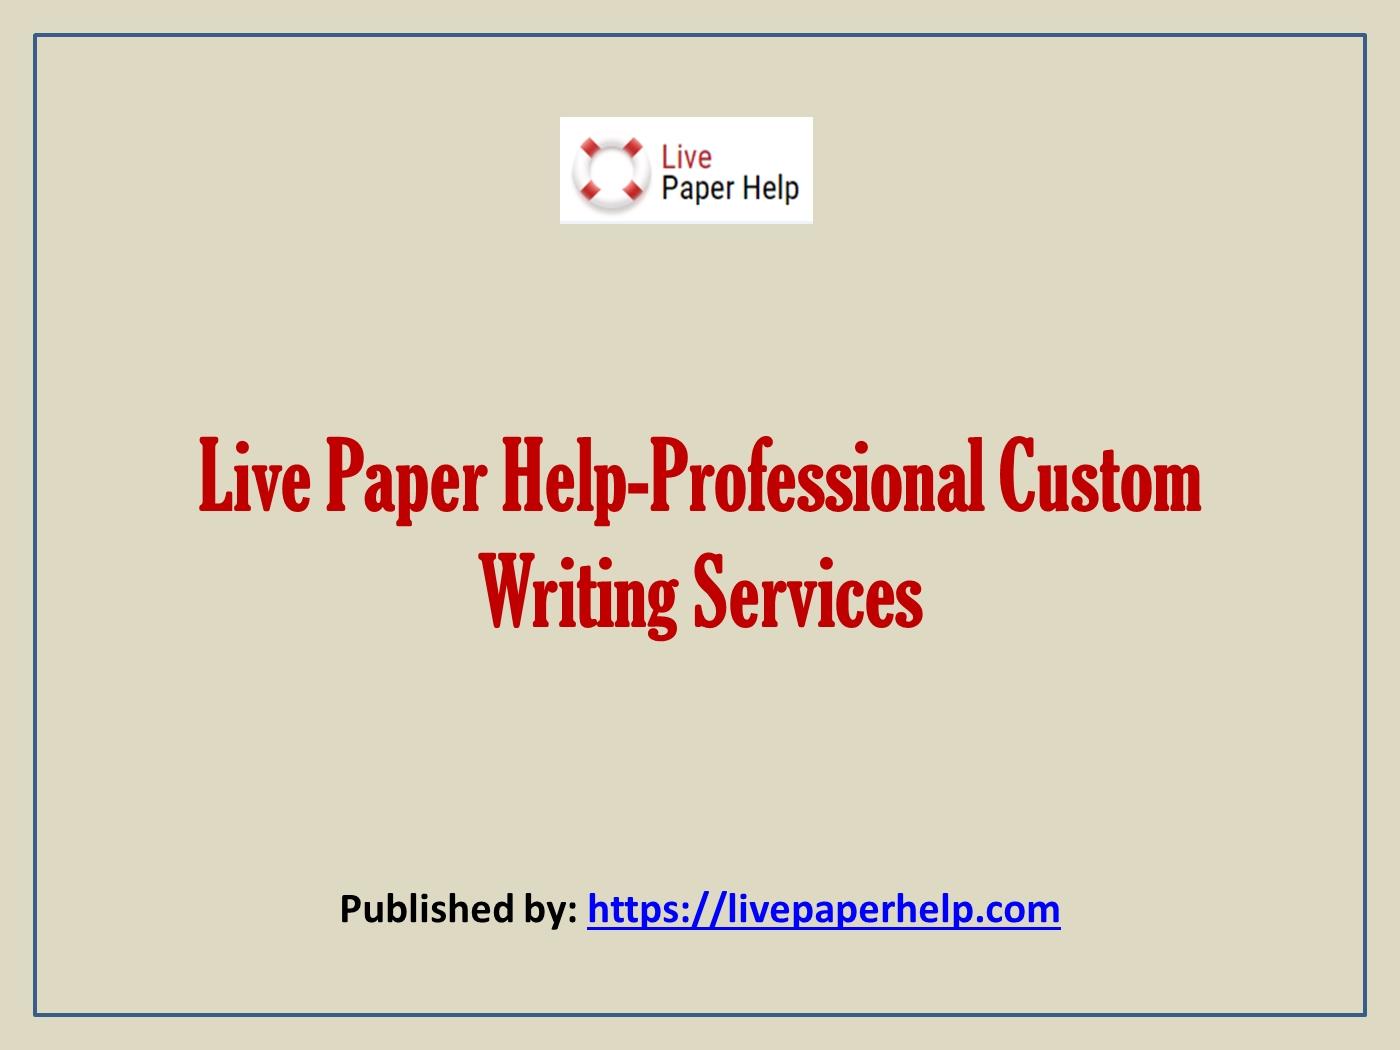 Live paper help